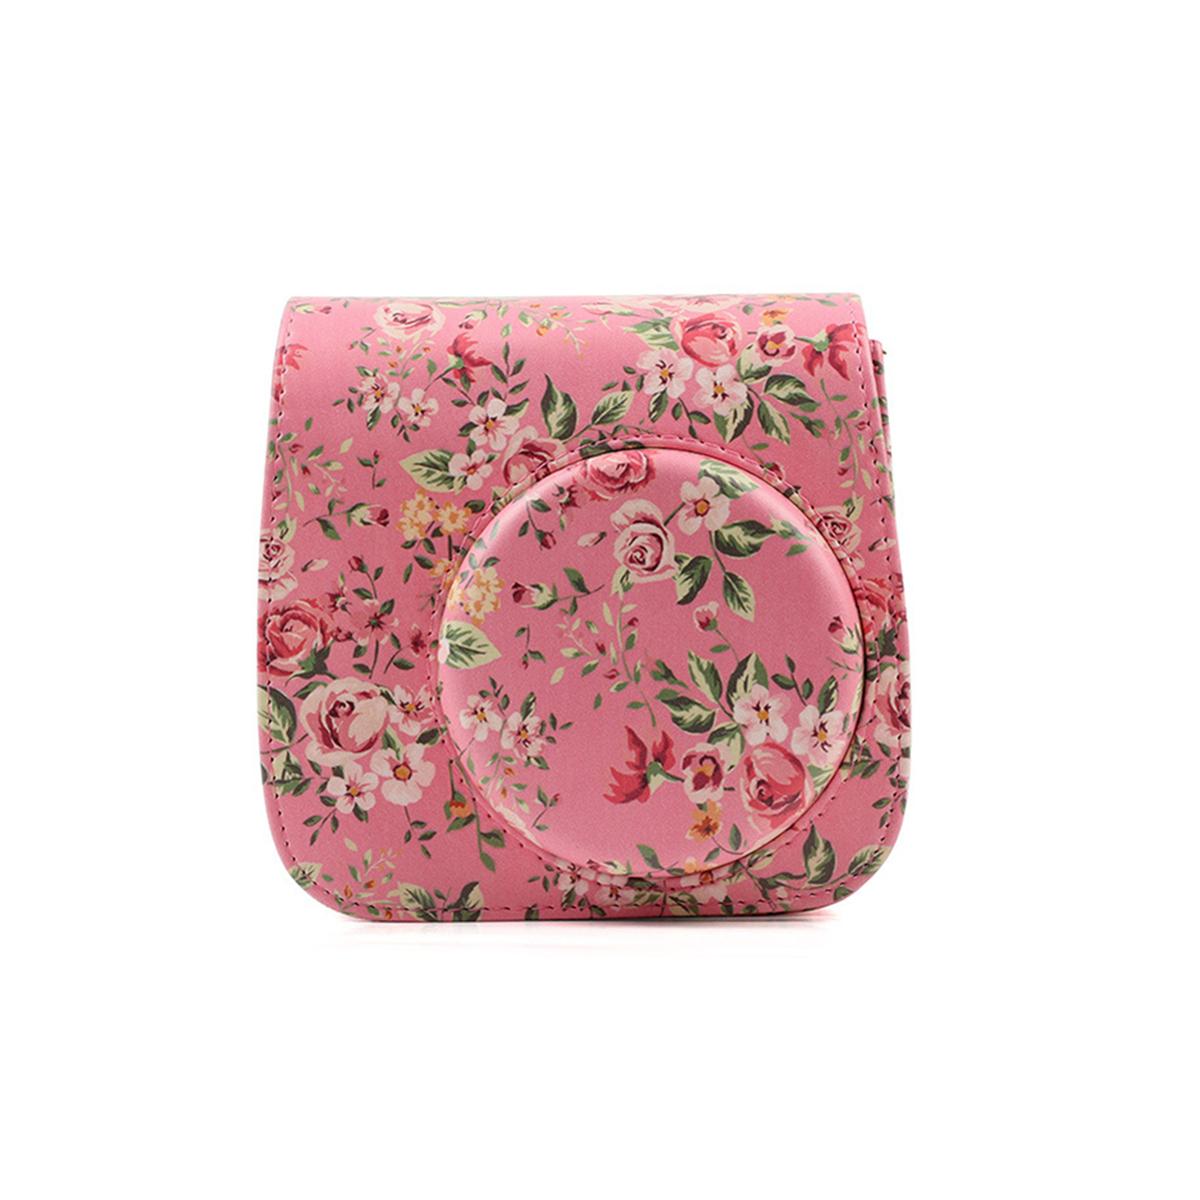 Floral Leather Camera Shoulder Bag Case Cover For Fujifilm Instax Mini 8/8+/9 | EBay